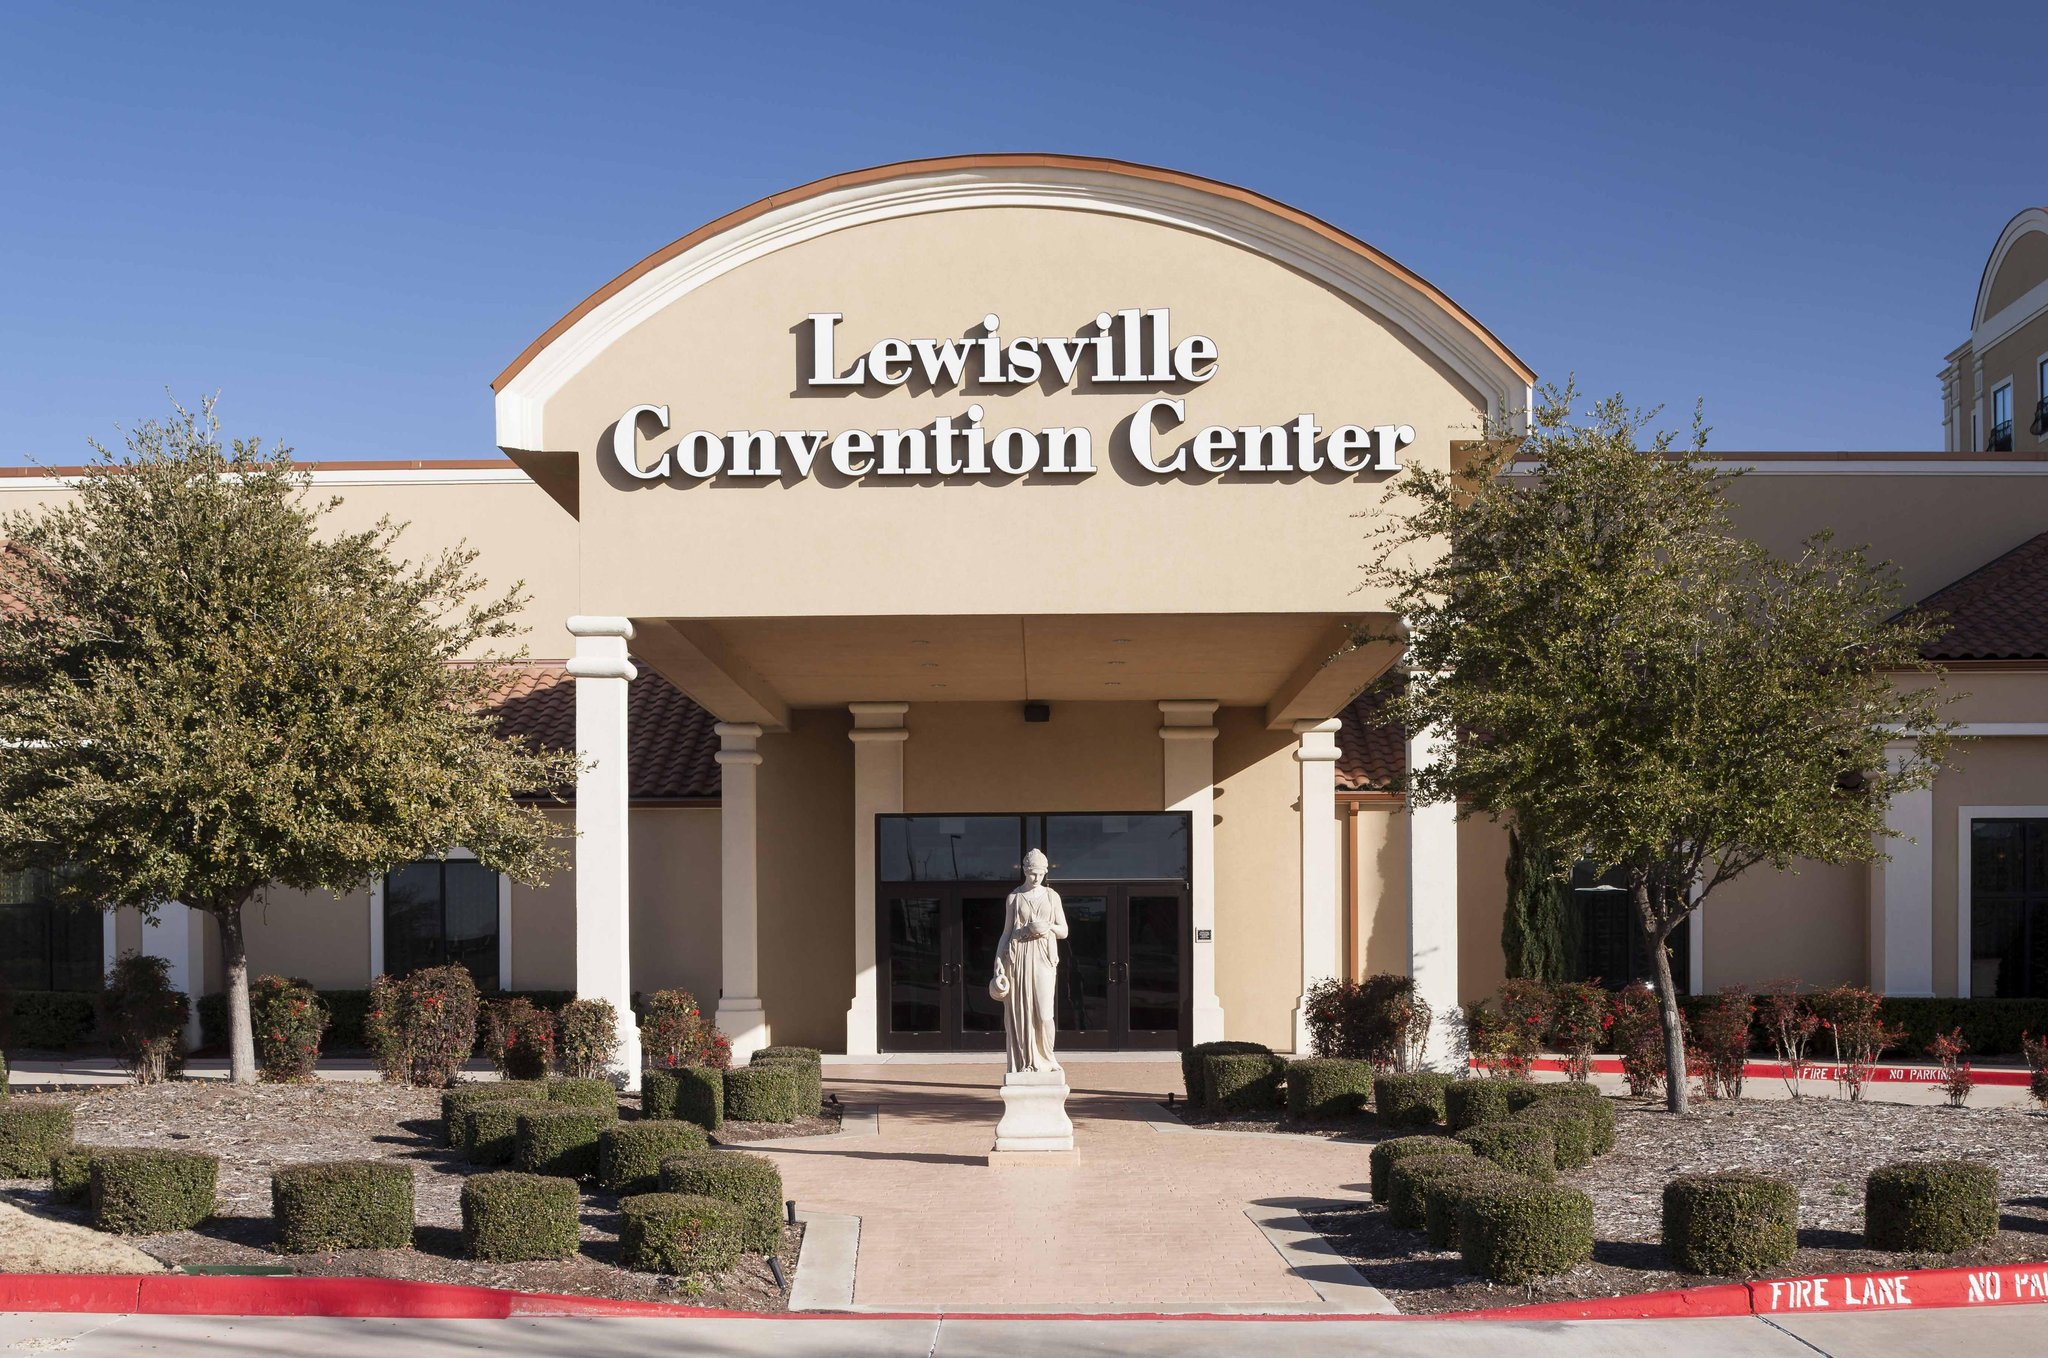 Meetings & Events at Hilton Garden Inn Dallas Lewisville